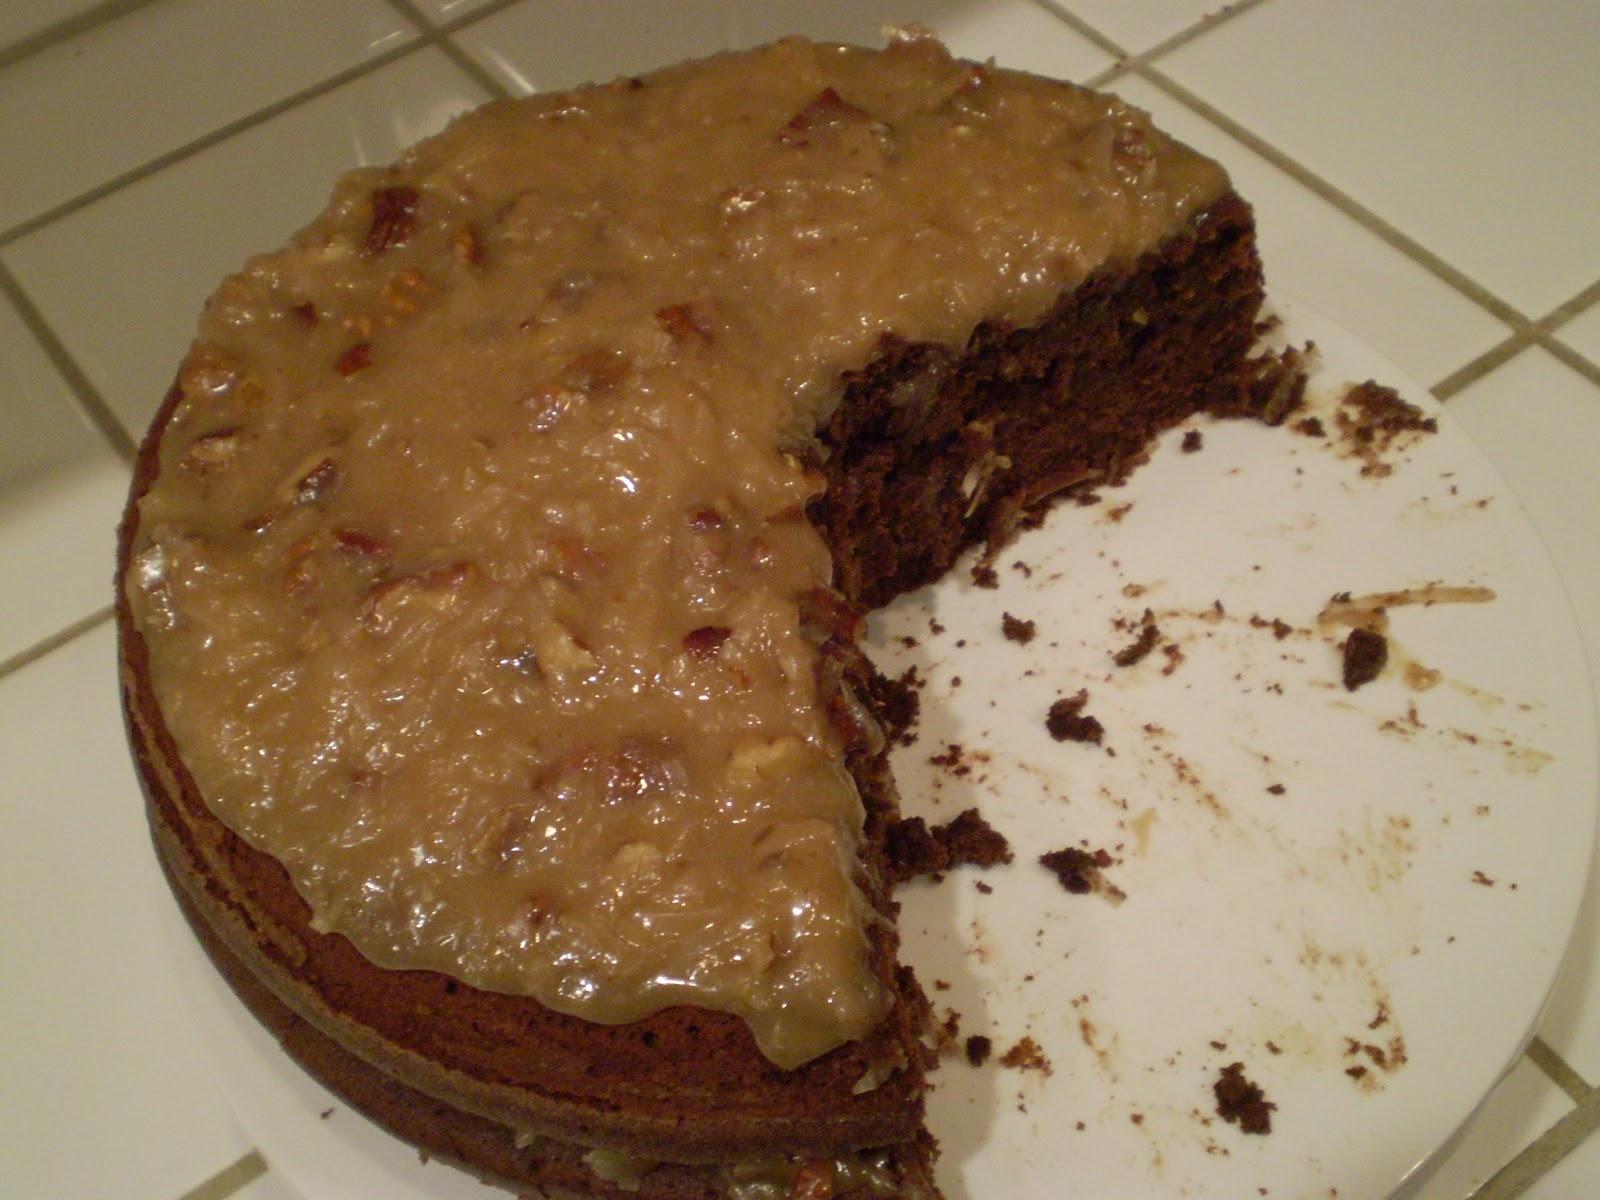 German Chocolate Cake Recipe Joy Of Baking: The Domestic Engineer: German Chocolate Cake